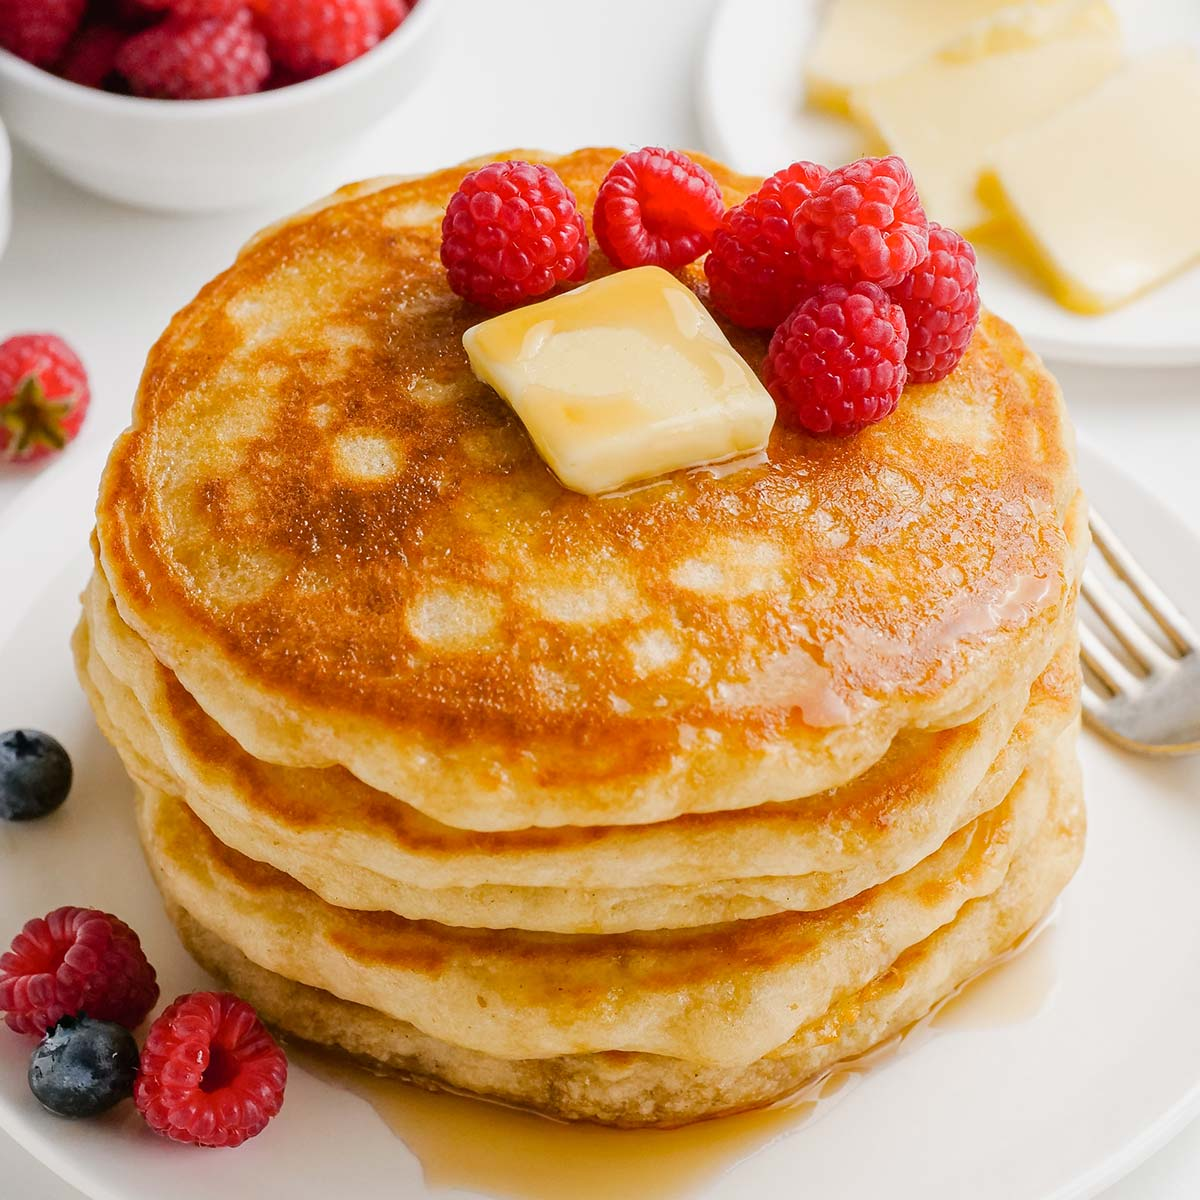 Substitute for Milk in Pancakes